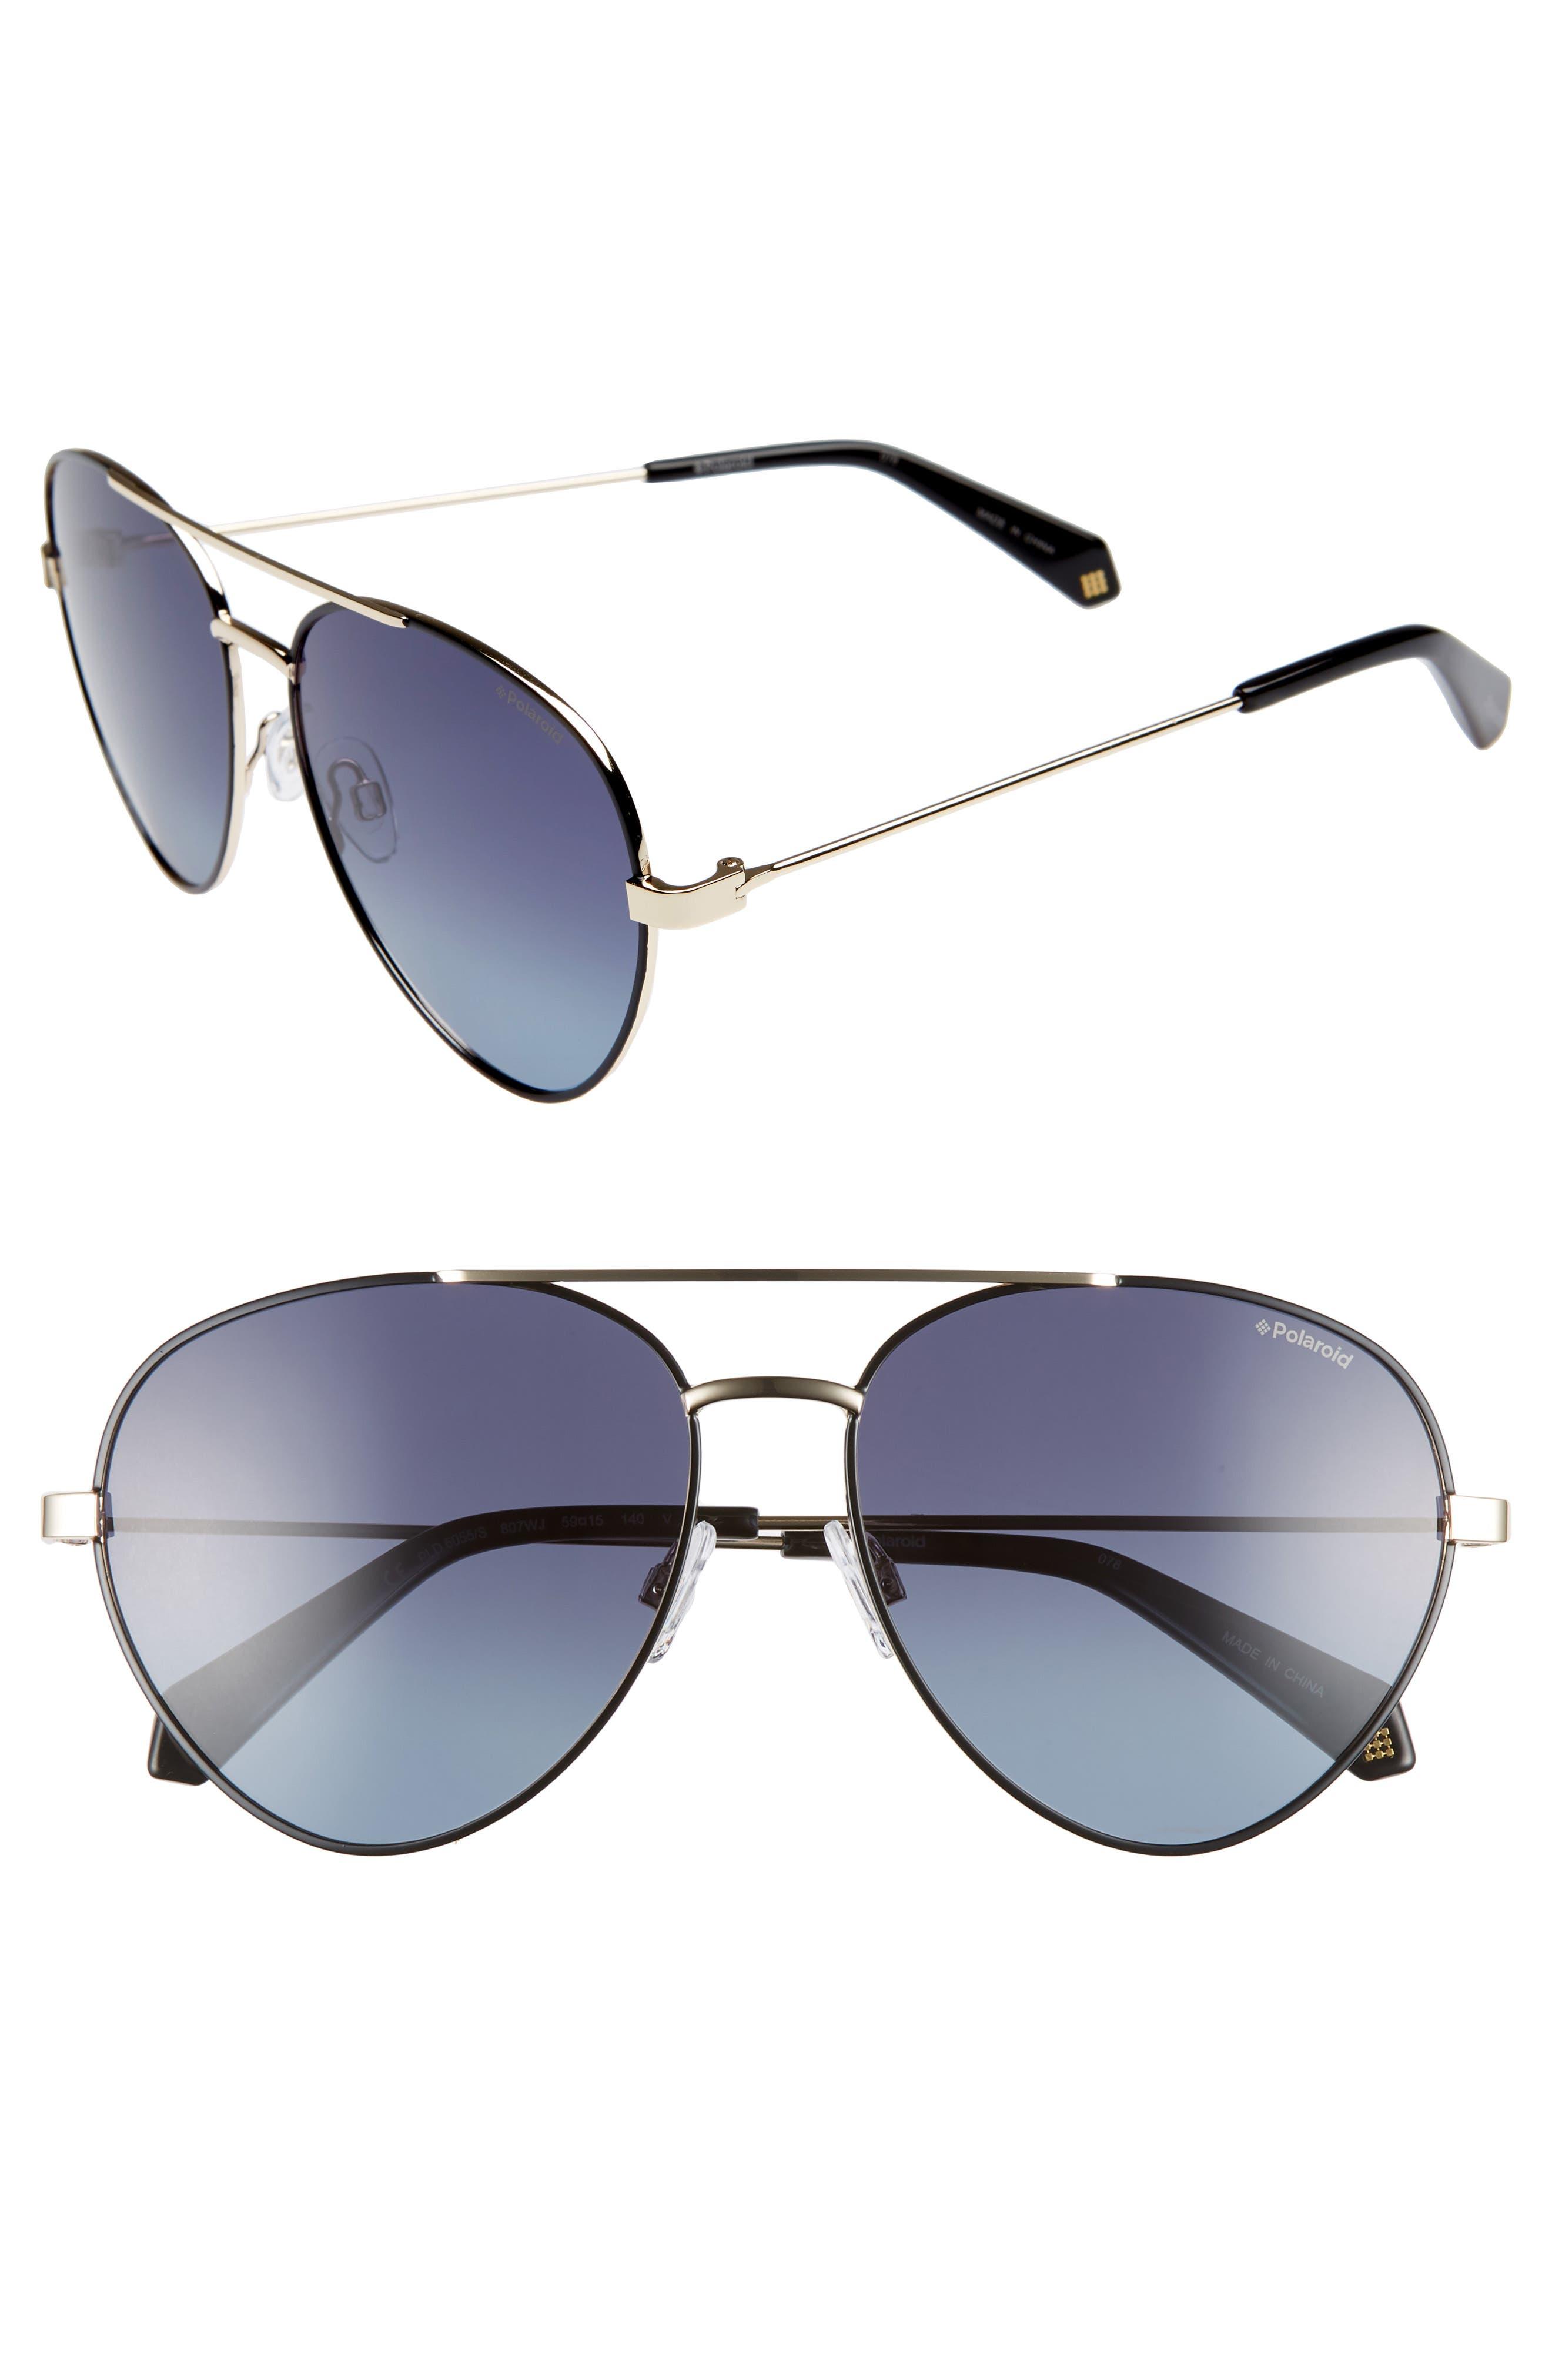 Polaroid 5m Polarized Aviator Sunglasses - Black